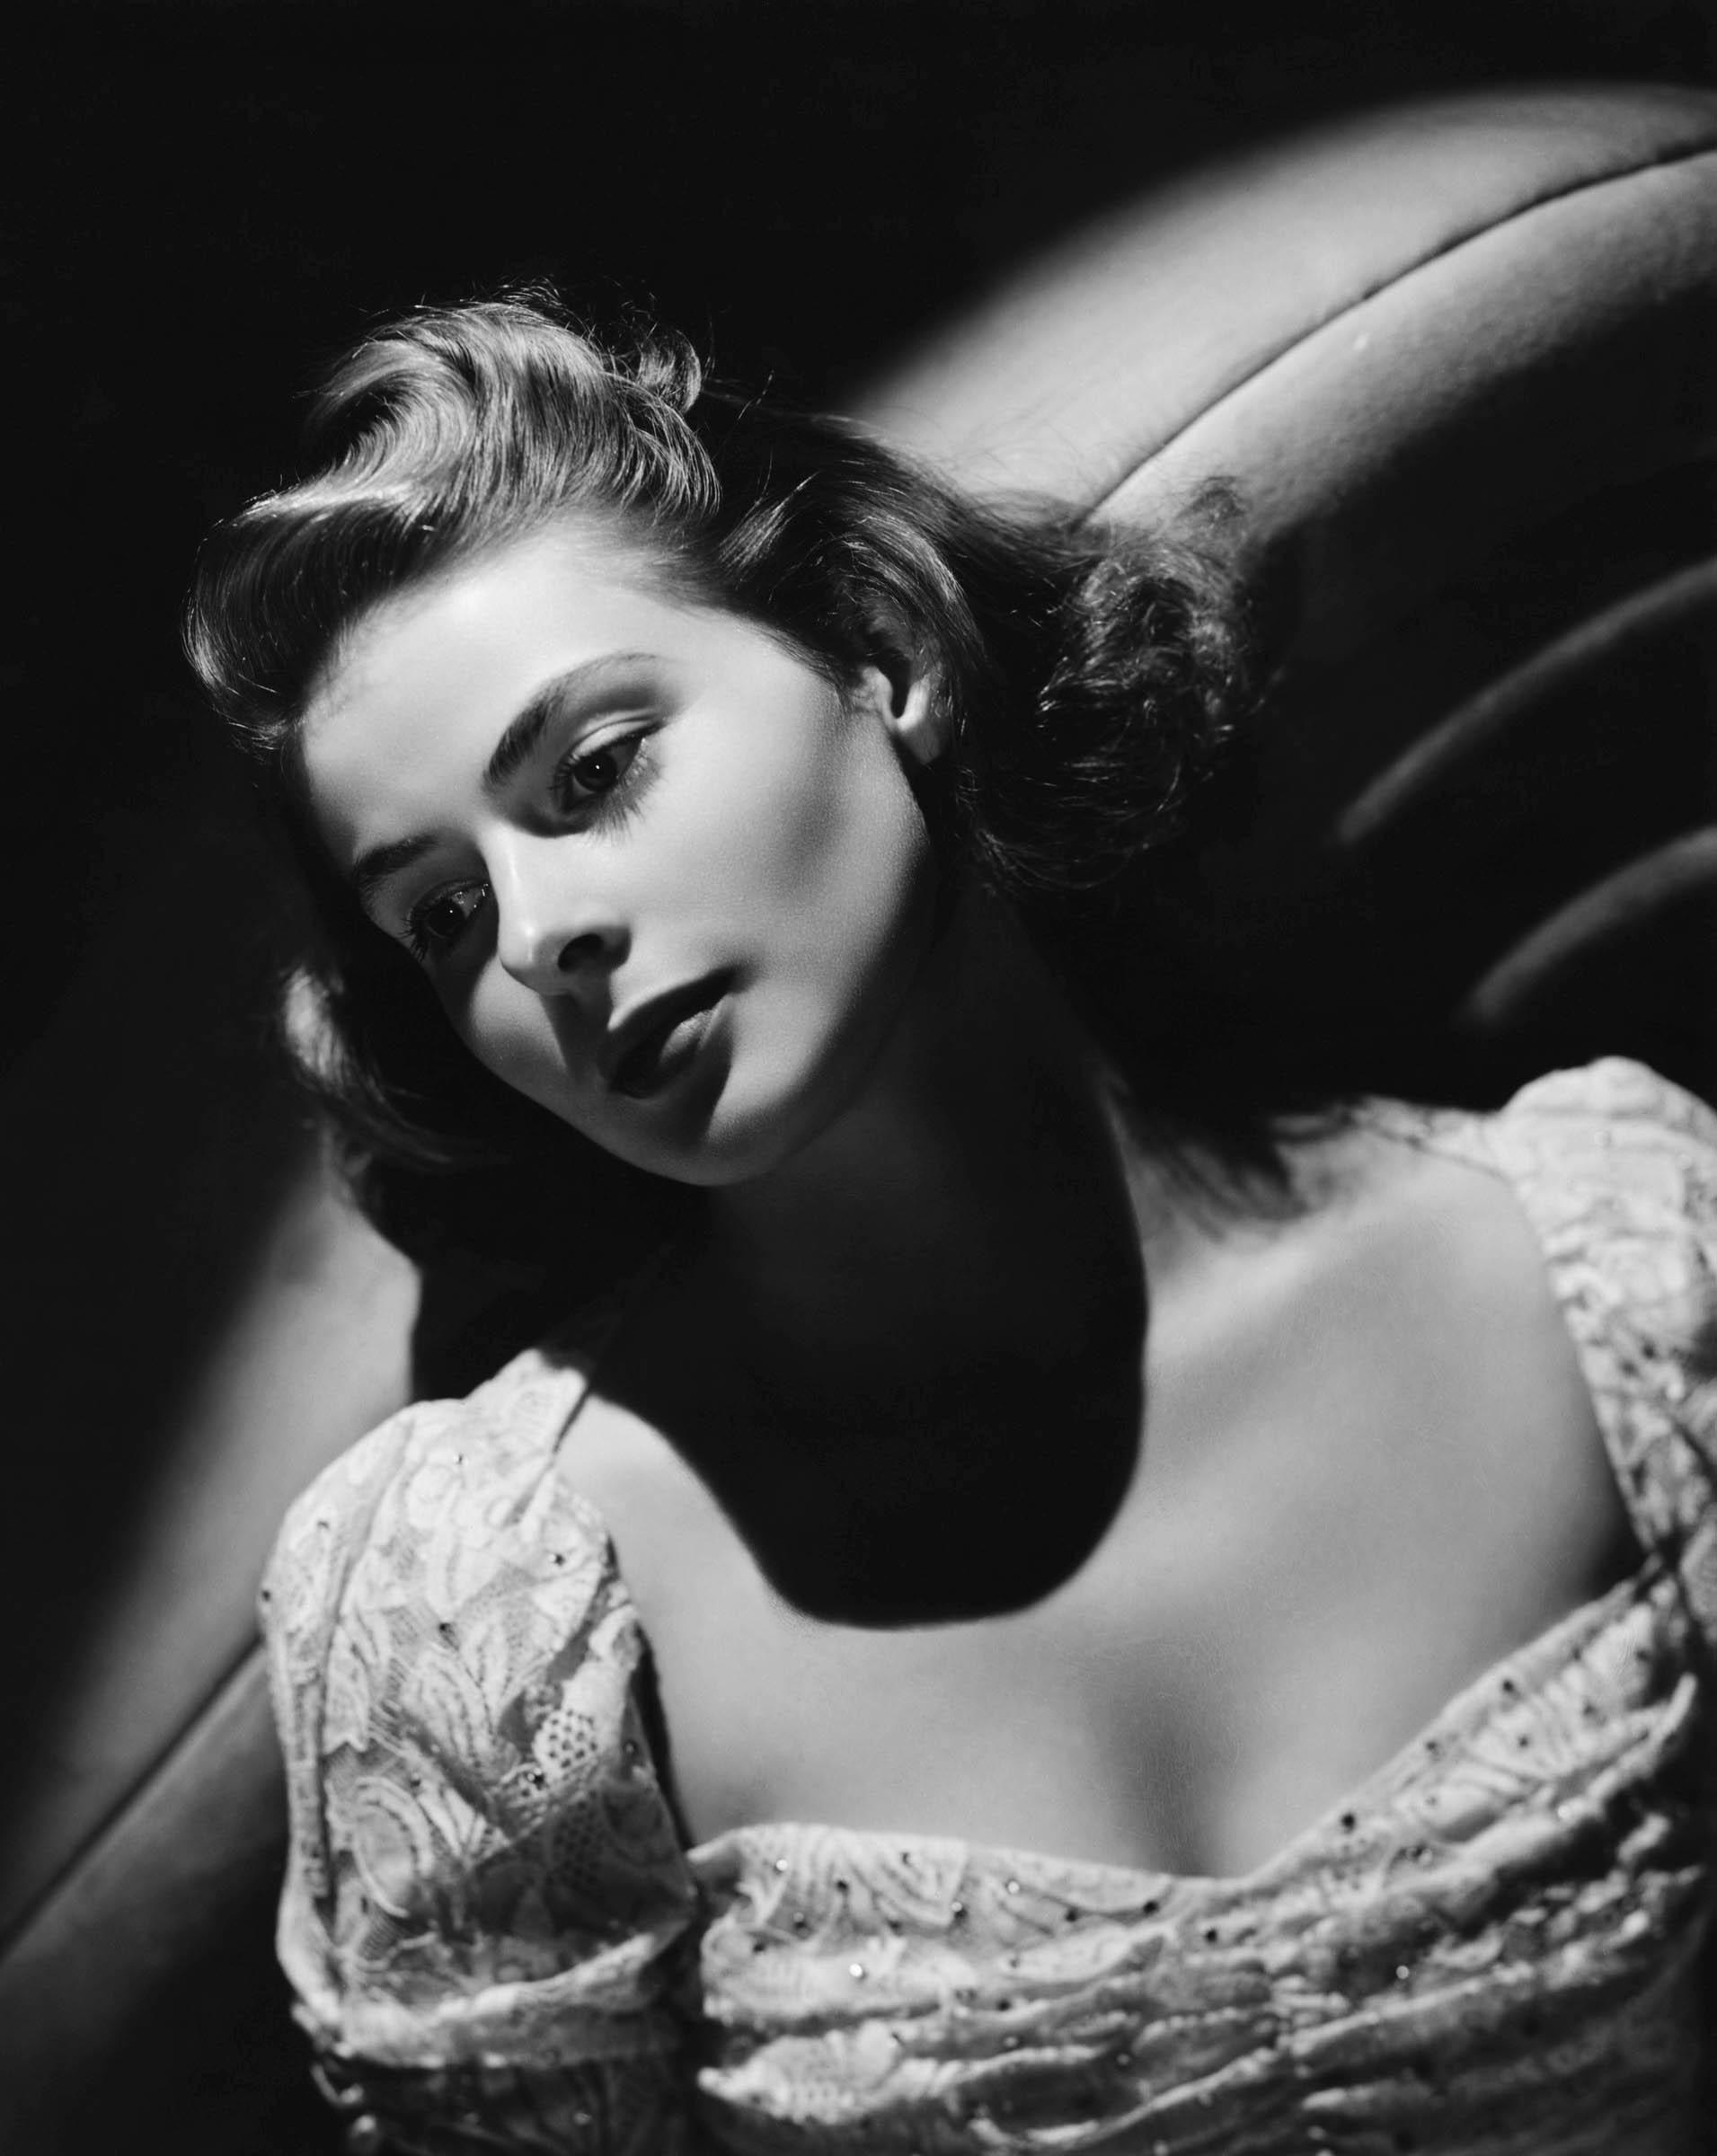 Ingrid Bergman For mobile